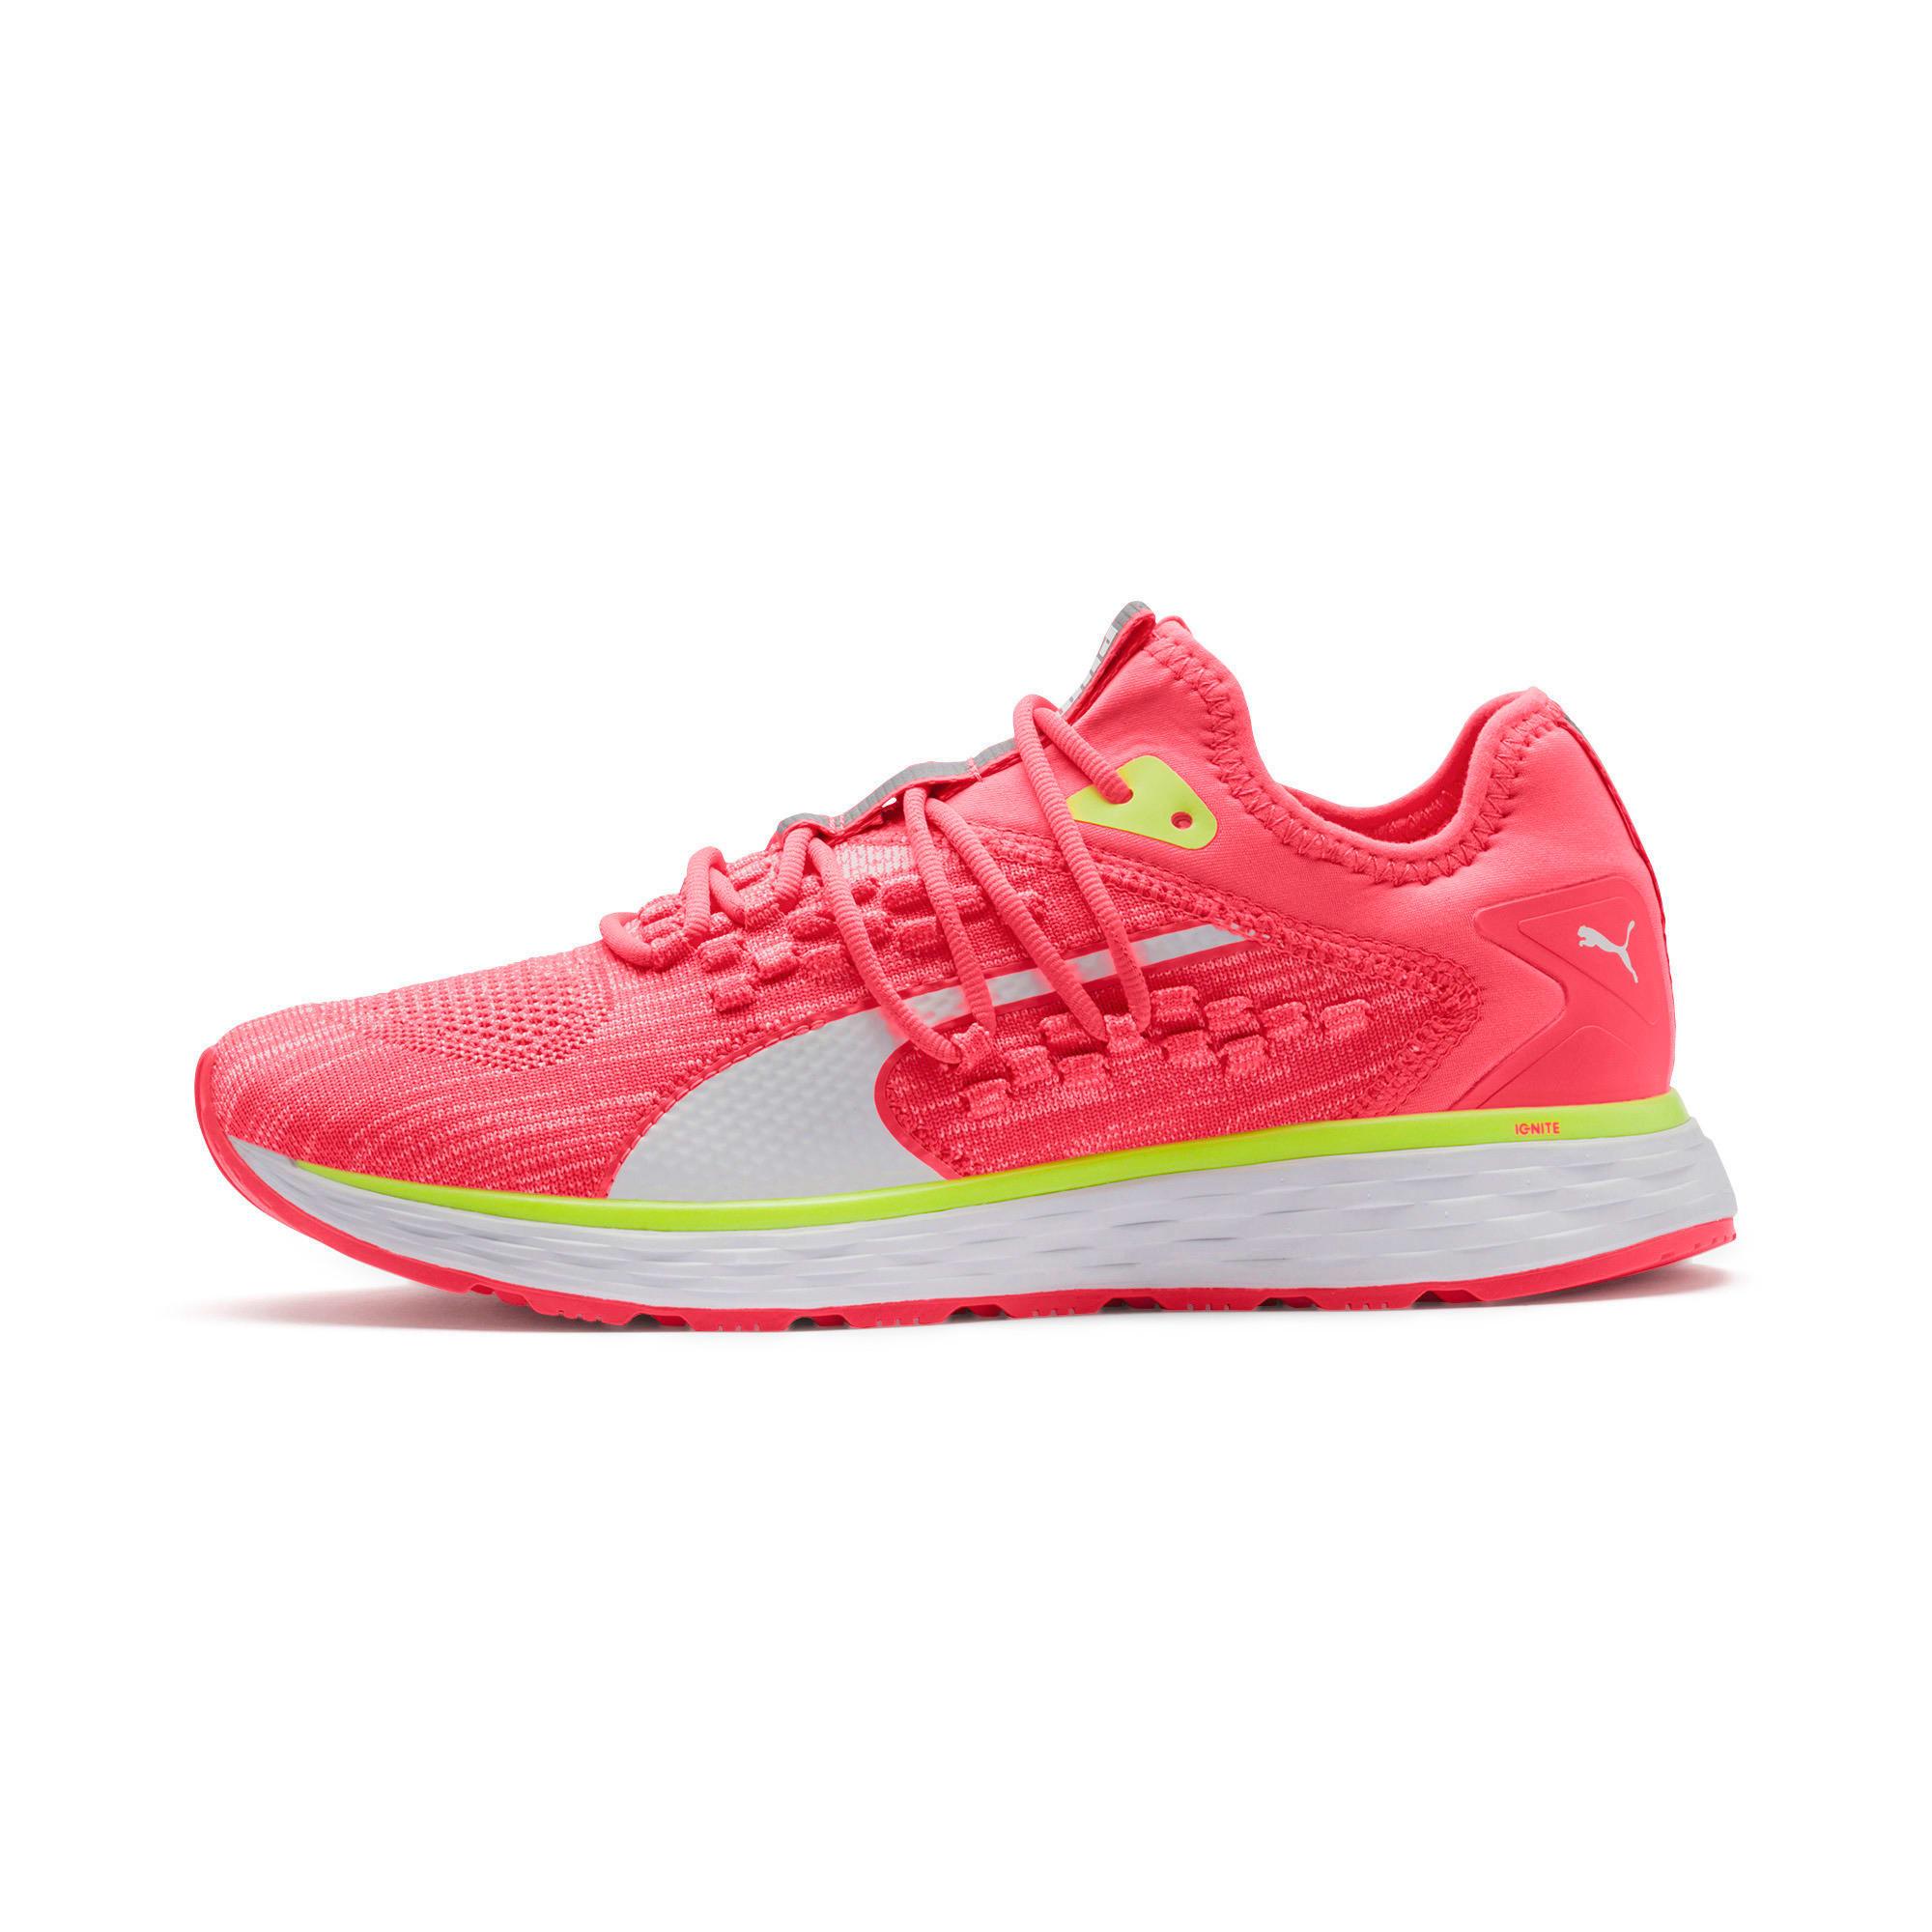 Thumbnail 1 of SPEED FUSEFIT Women's Running Shoes, Pink Alert-Puma White, medium